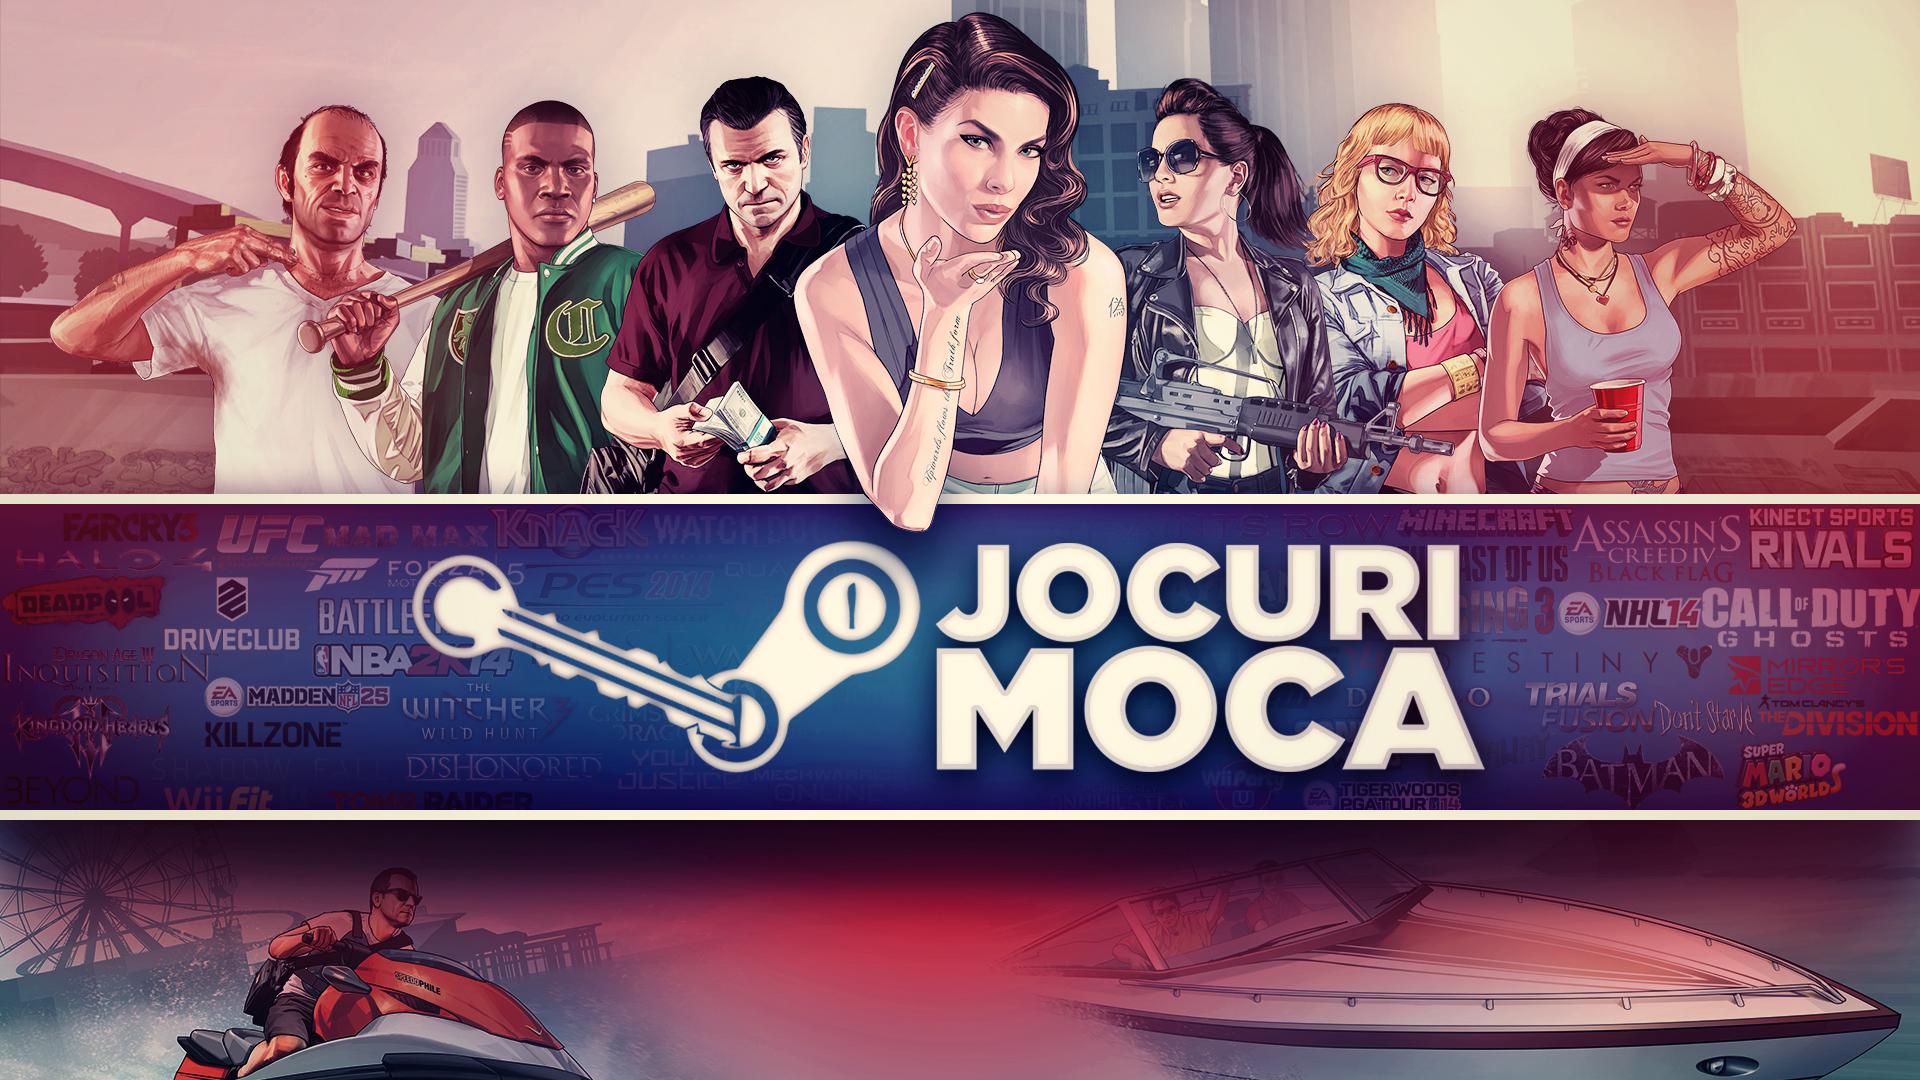 Jocuri moca Wallpaper by eduard2009